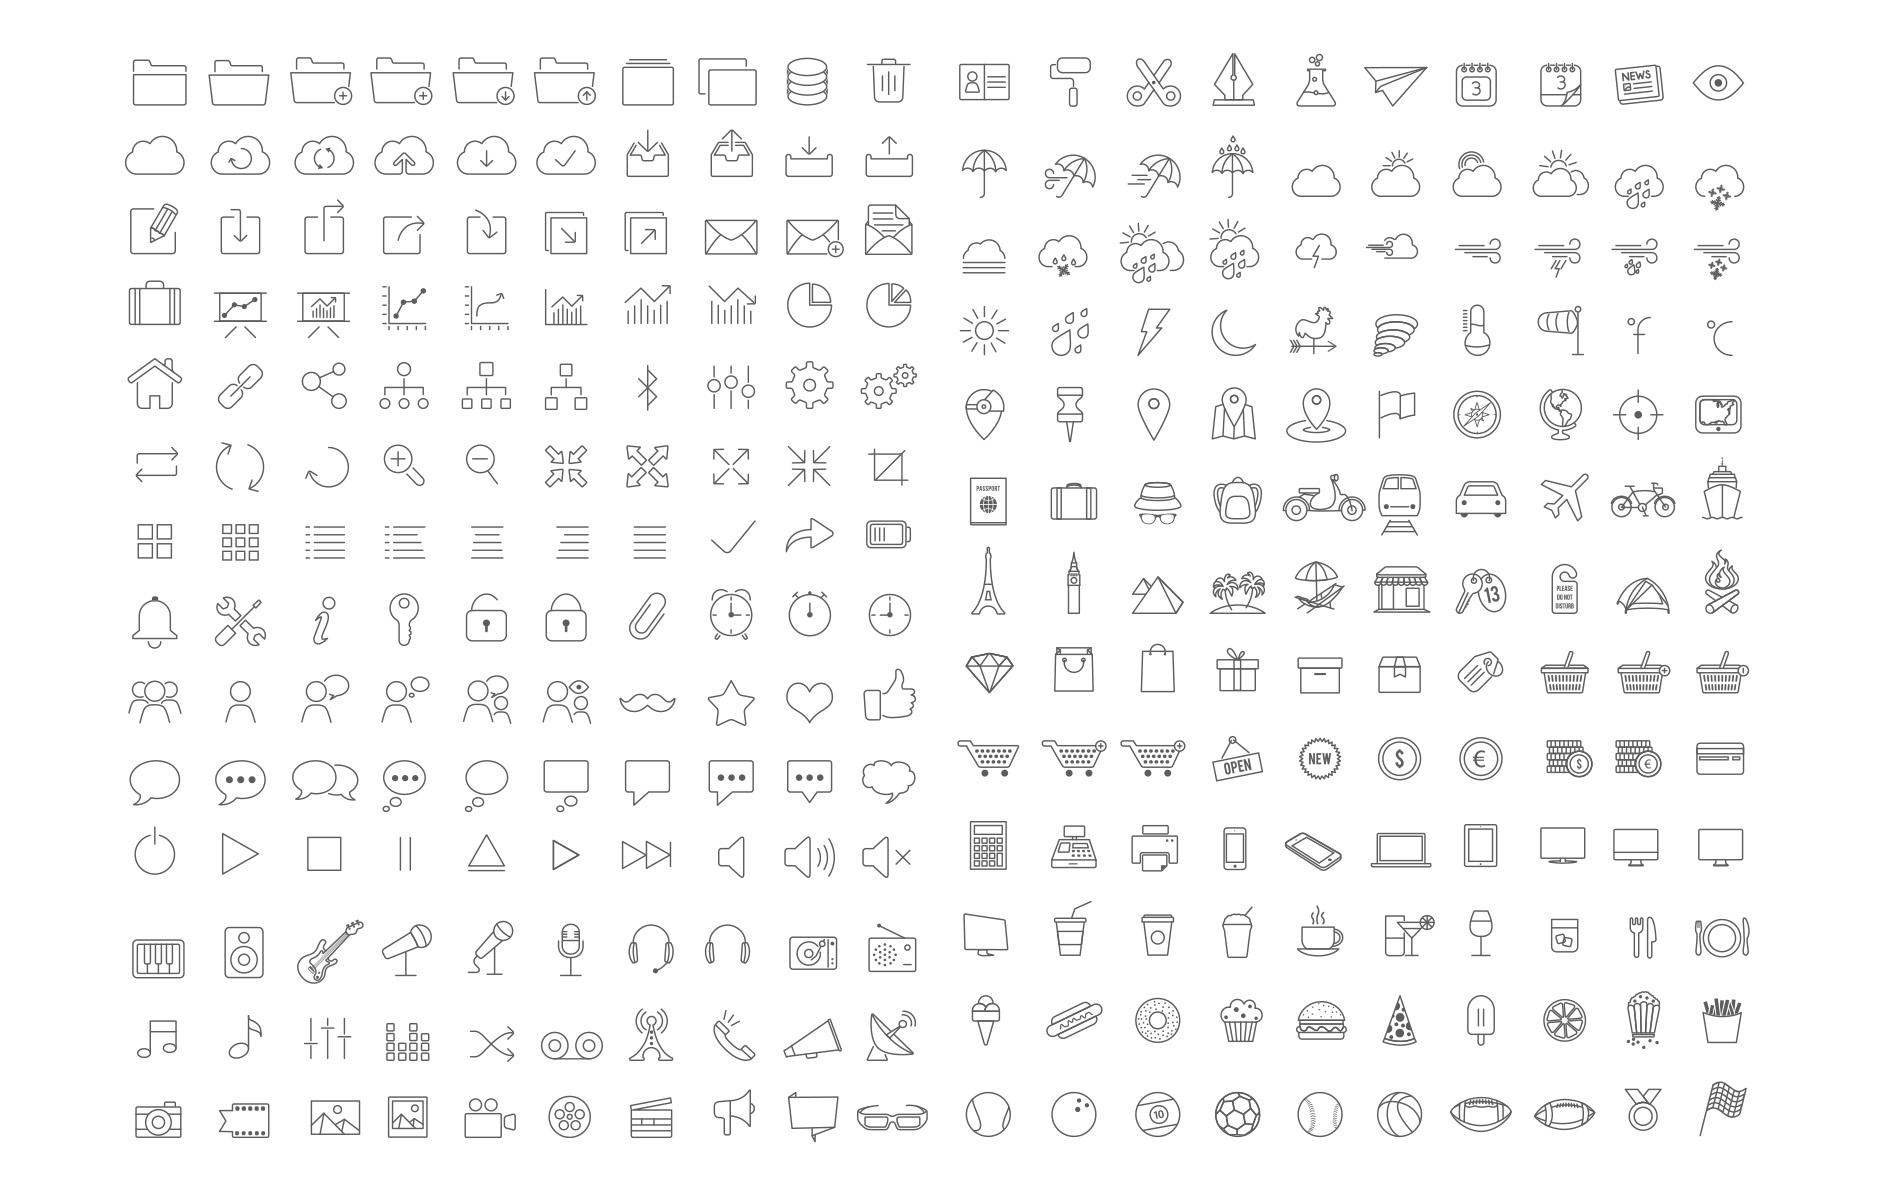 https://s3.tmimgcdn.com/templates/3924/scr/outline-icons.jpg